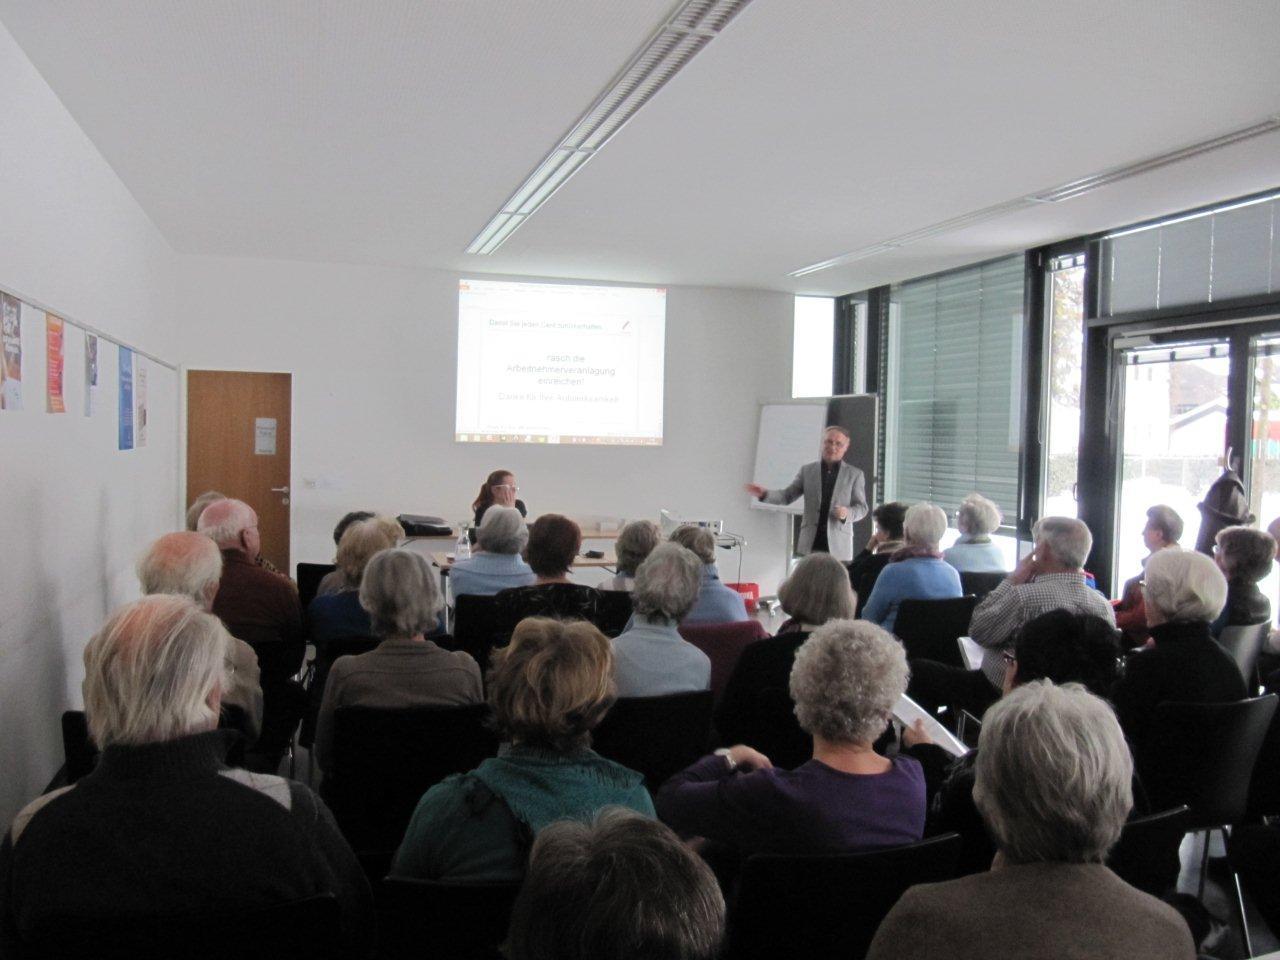 Wertvoller Vortrag vor vollem Saal